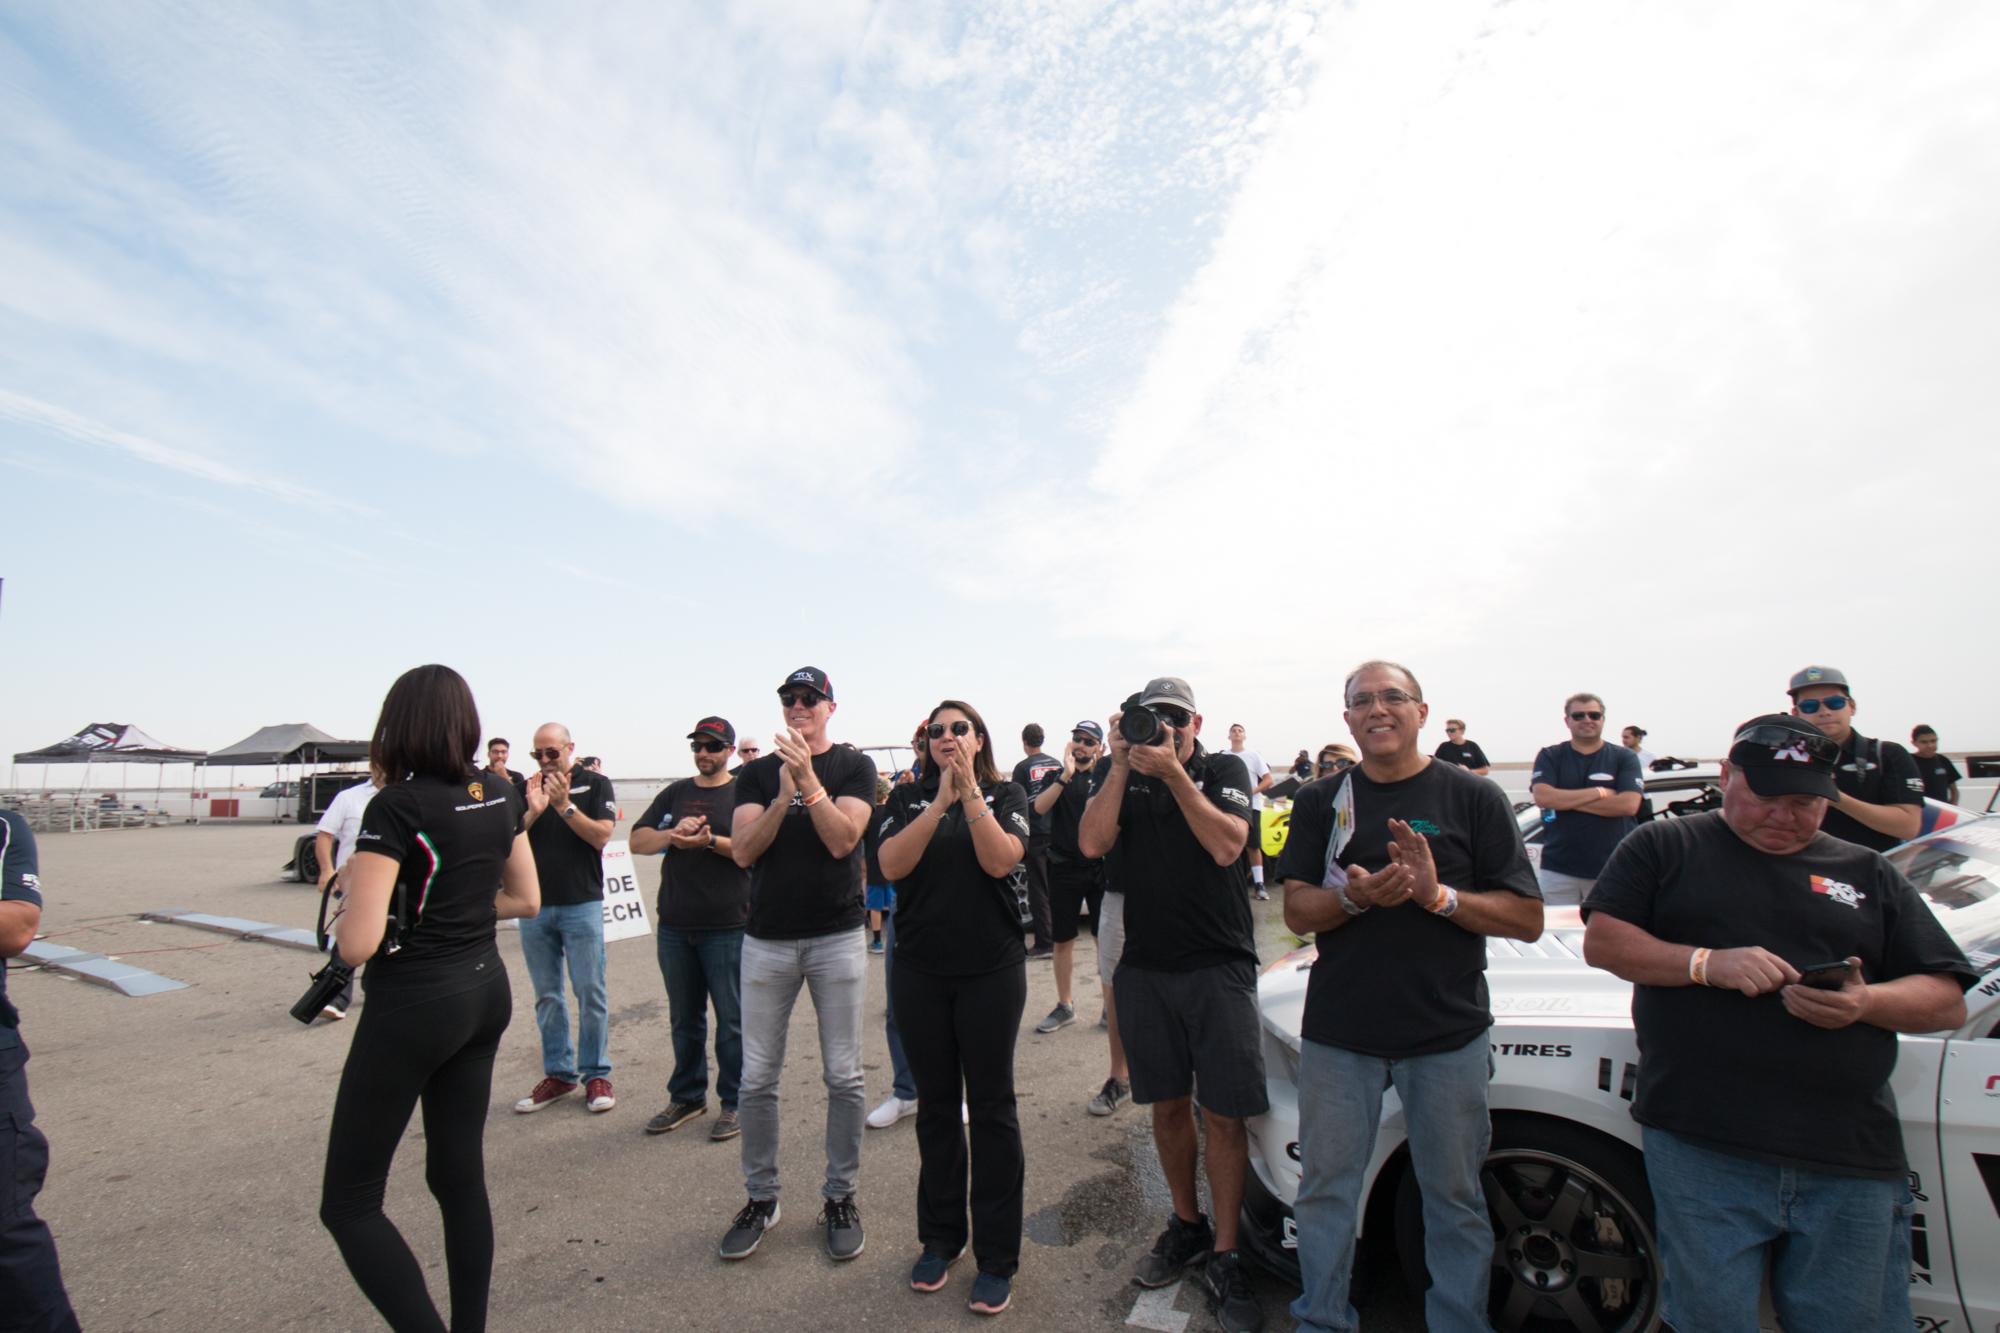 Steven-Racing-20130301-55732.jpg